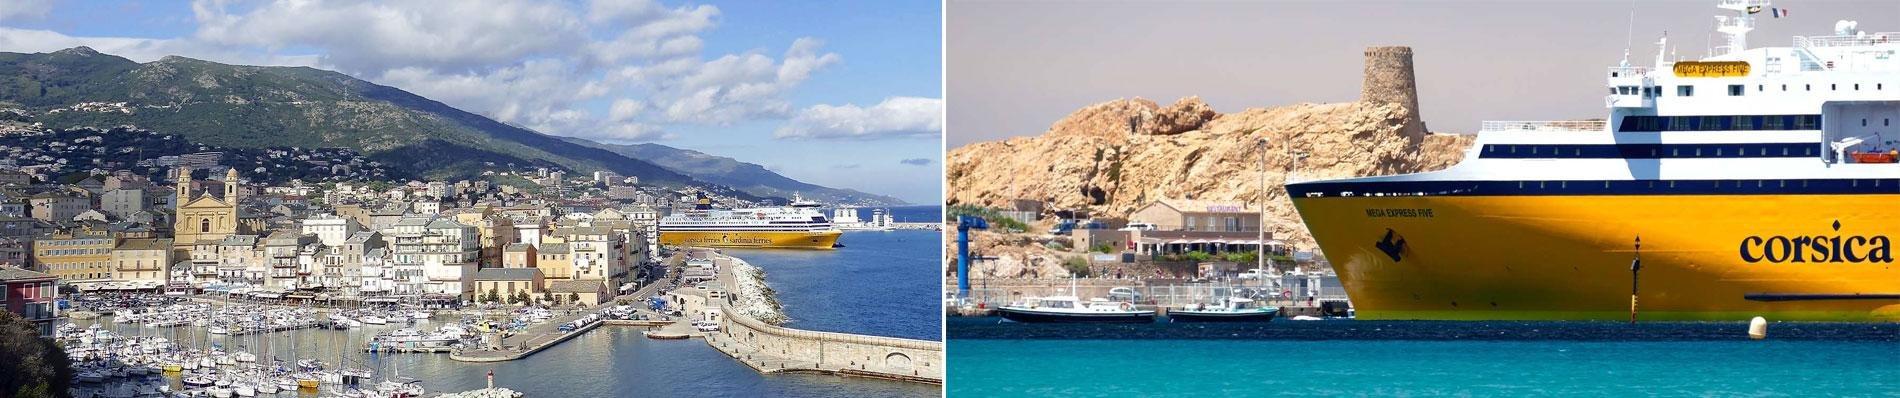 corsica vakantie autorondreis ferry